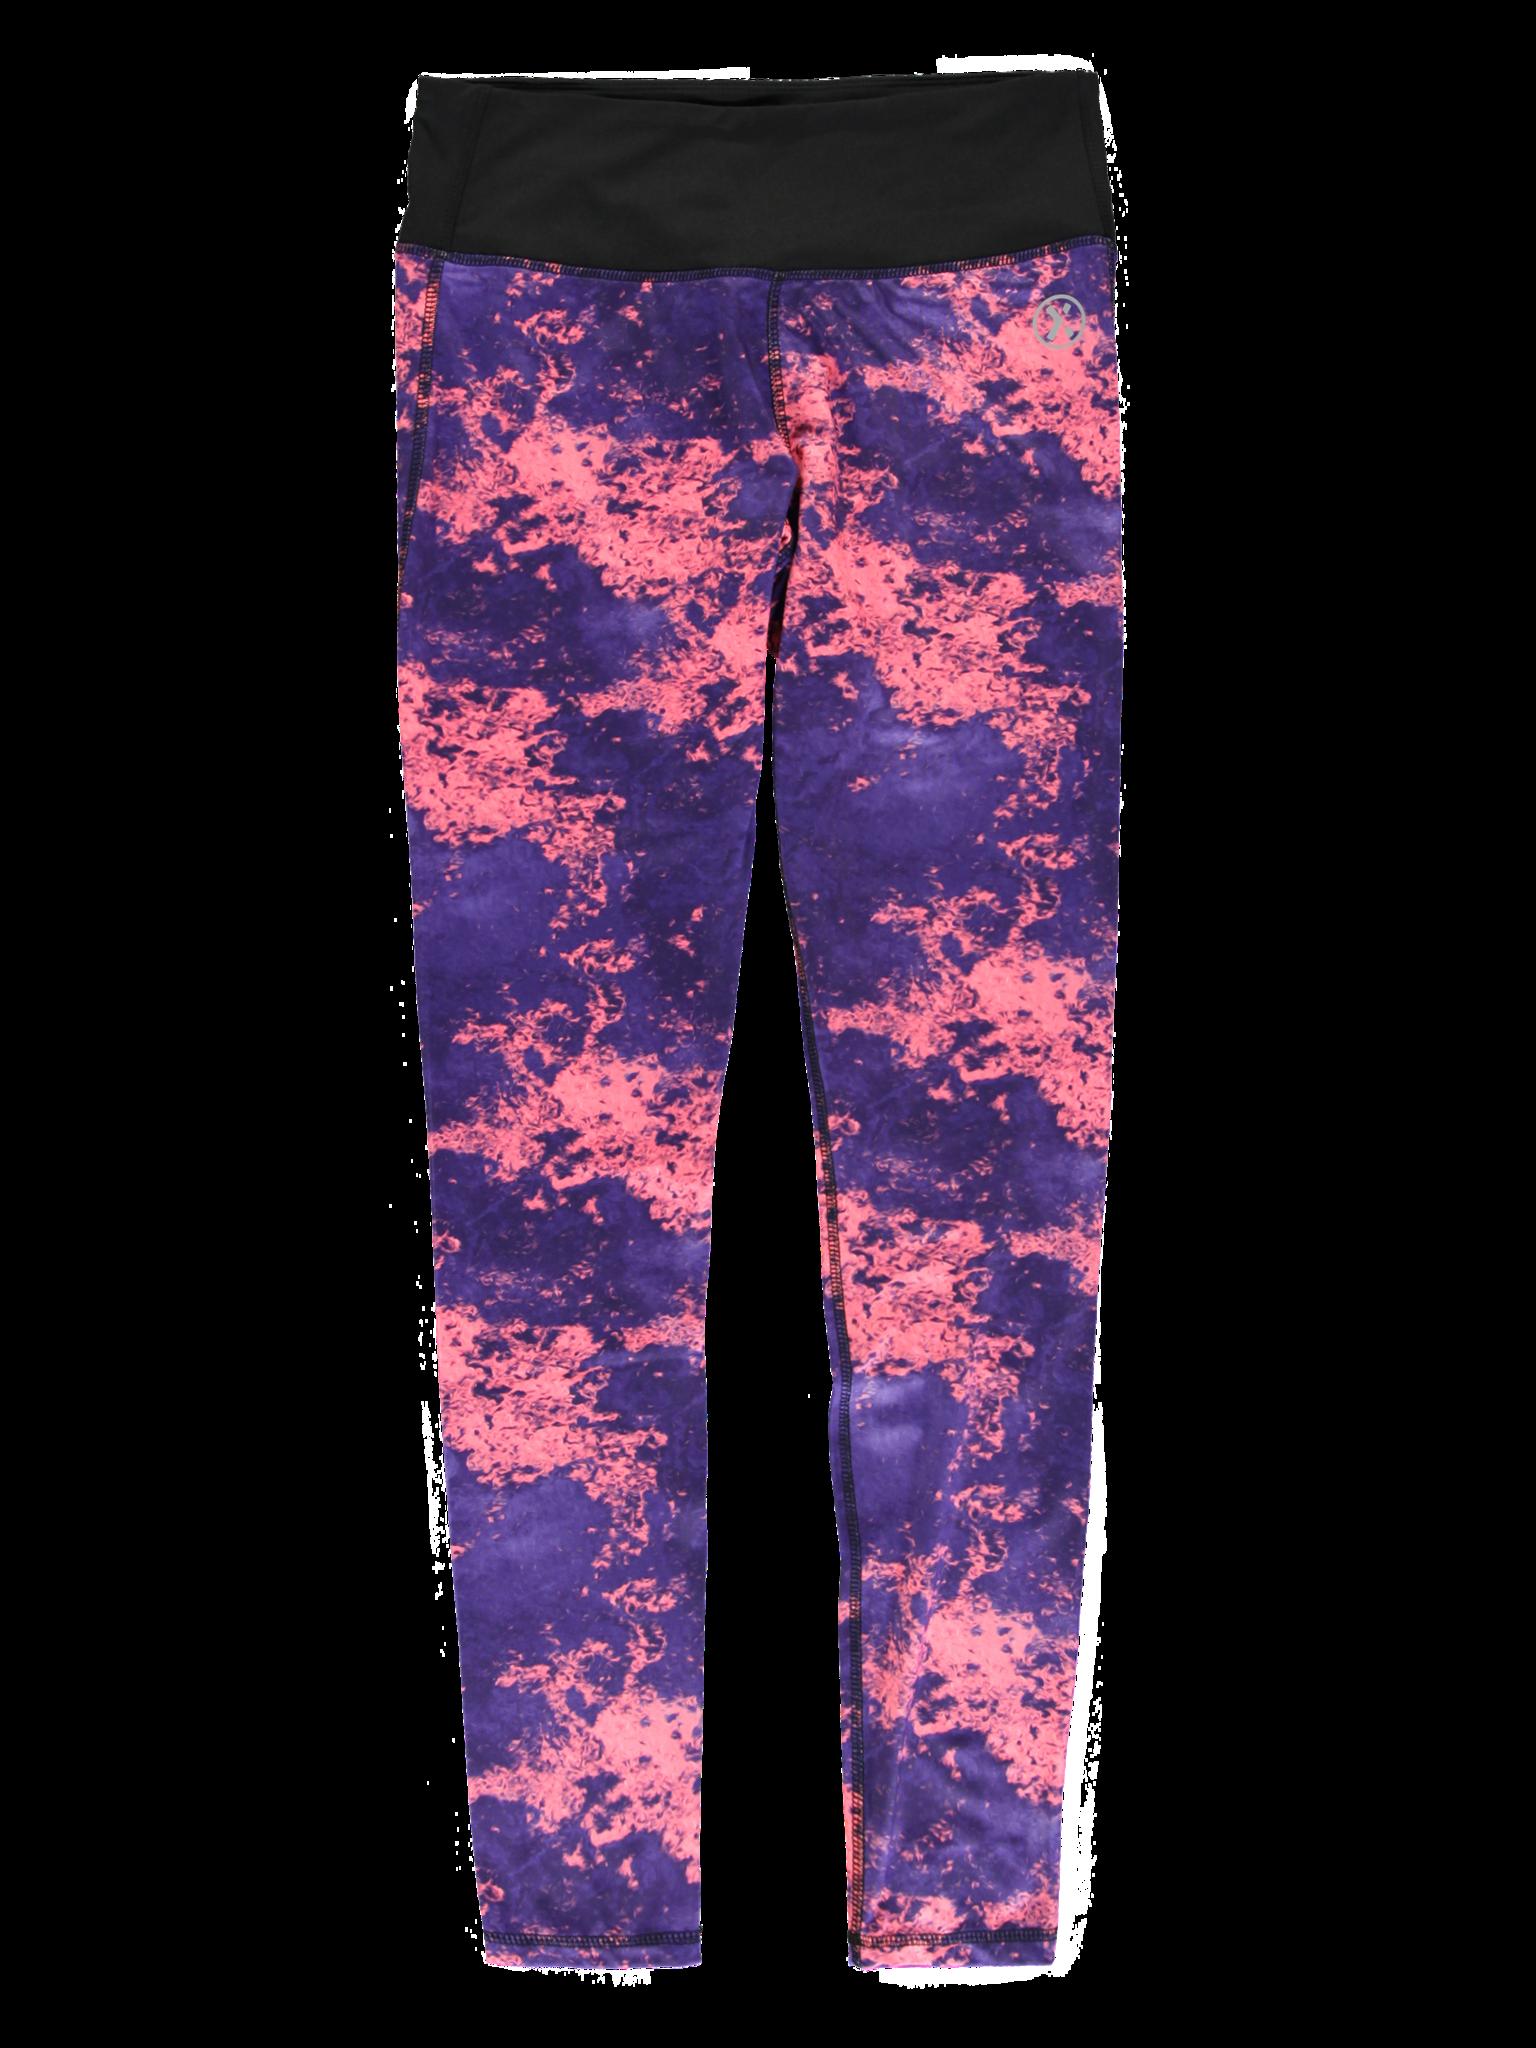 All Brands | Summerproducts Ladies | Legging | 18 pcs/box